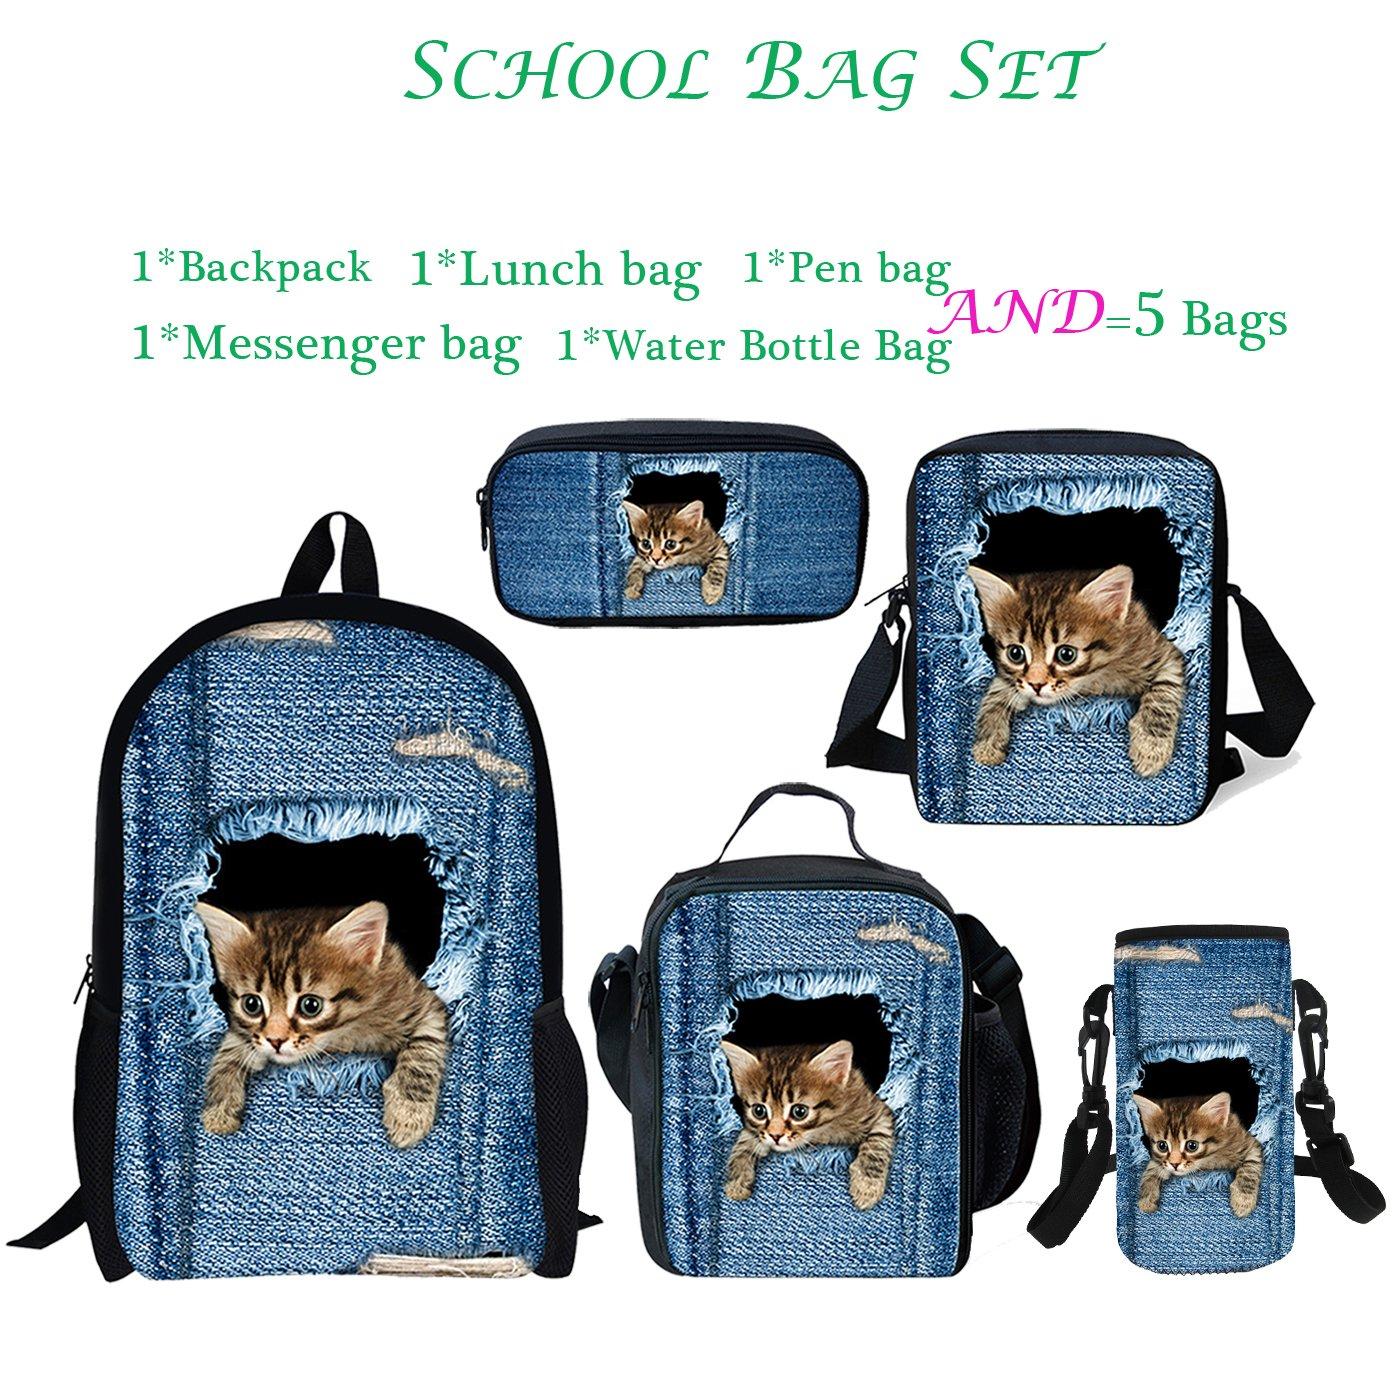 ThiKin 5 School Bags Set Cute Cat Backpack Lunch Bag Messenger Bag Pen Bag Water Bottle Carrier for Kids